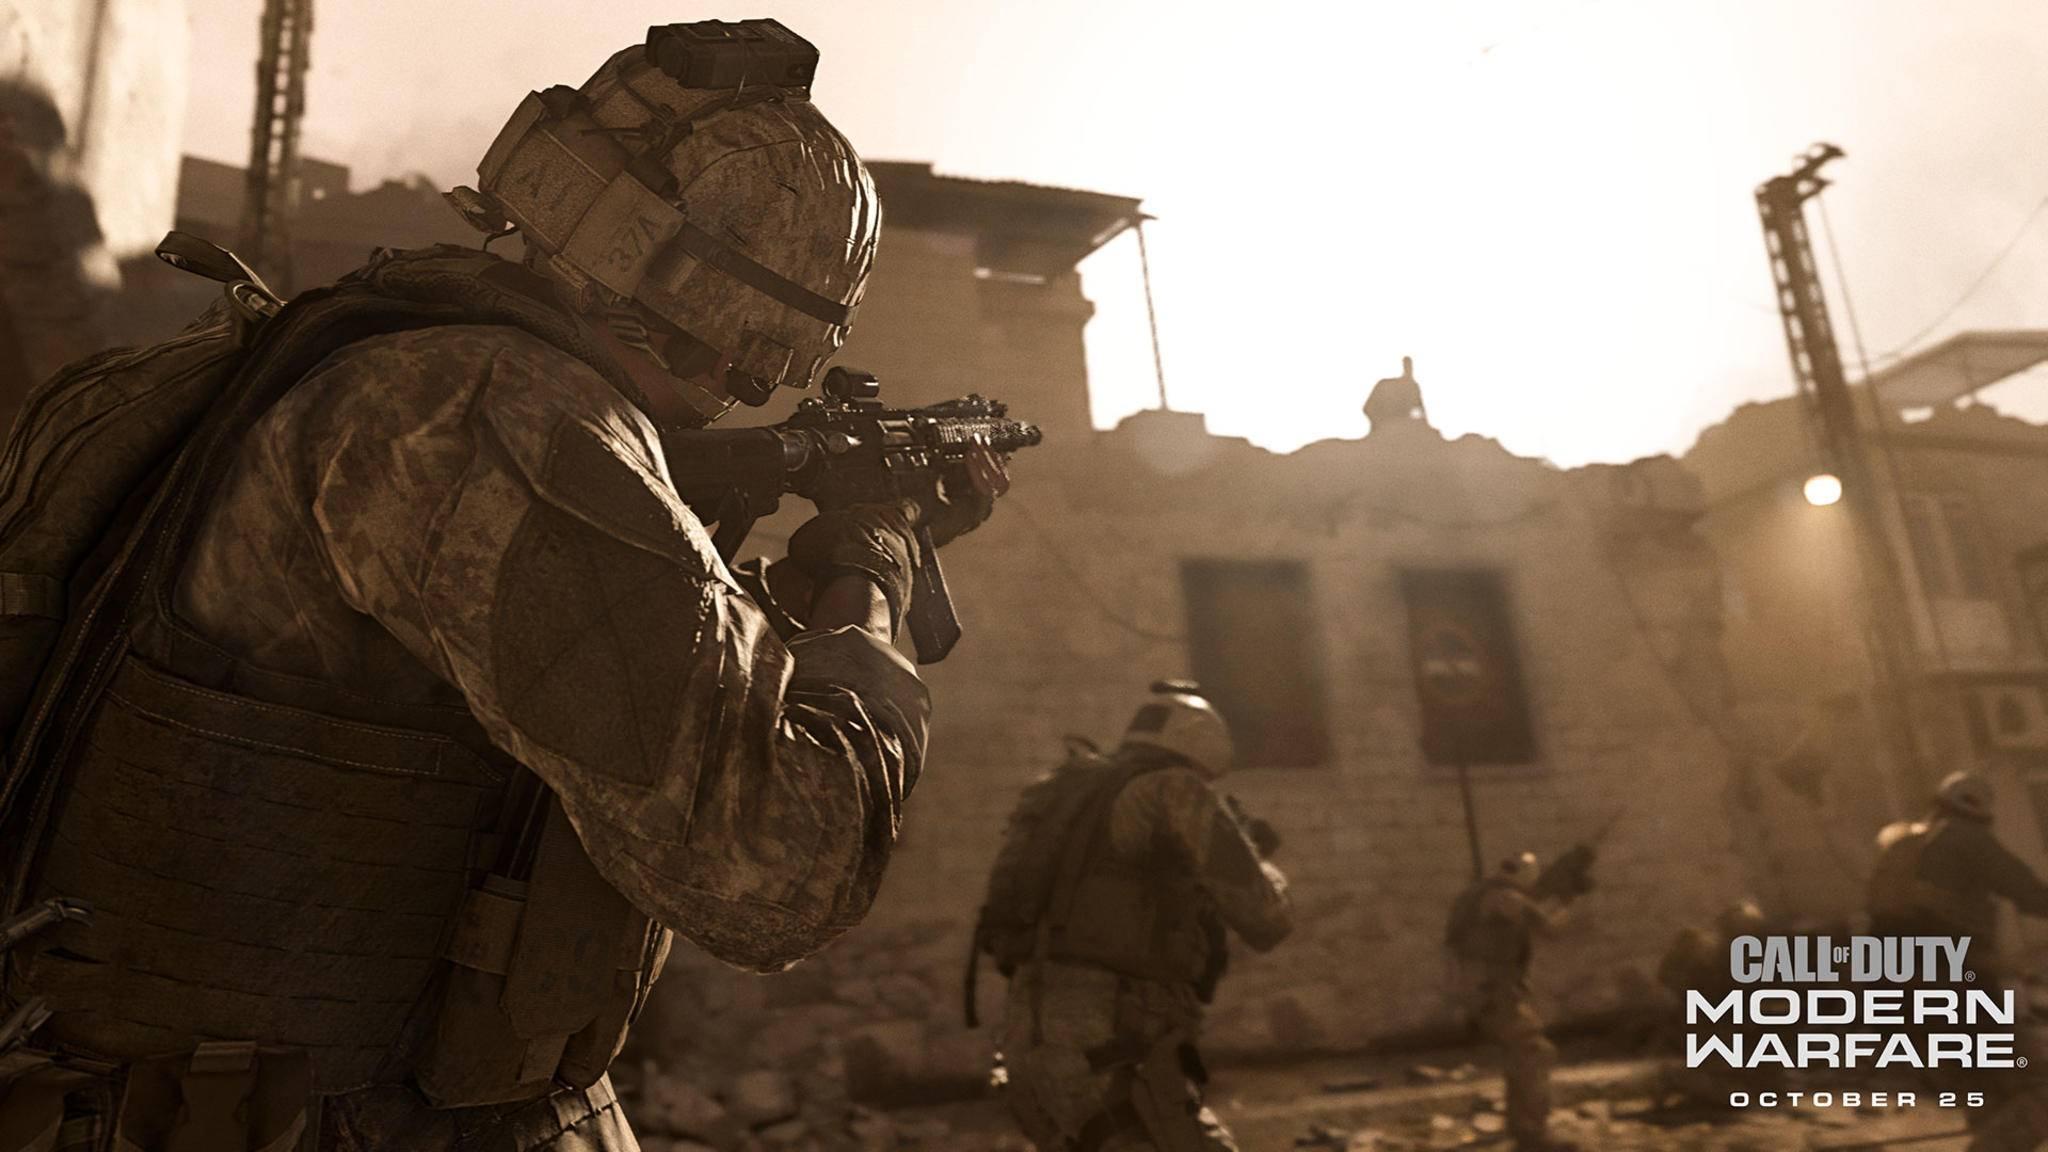 """Call of Duty: Modern Warfare"": So funktioniert das Crossplay-Feature"